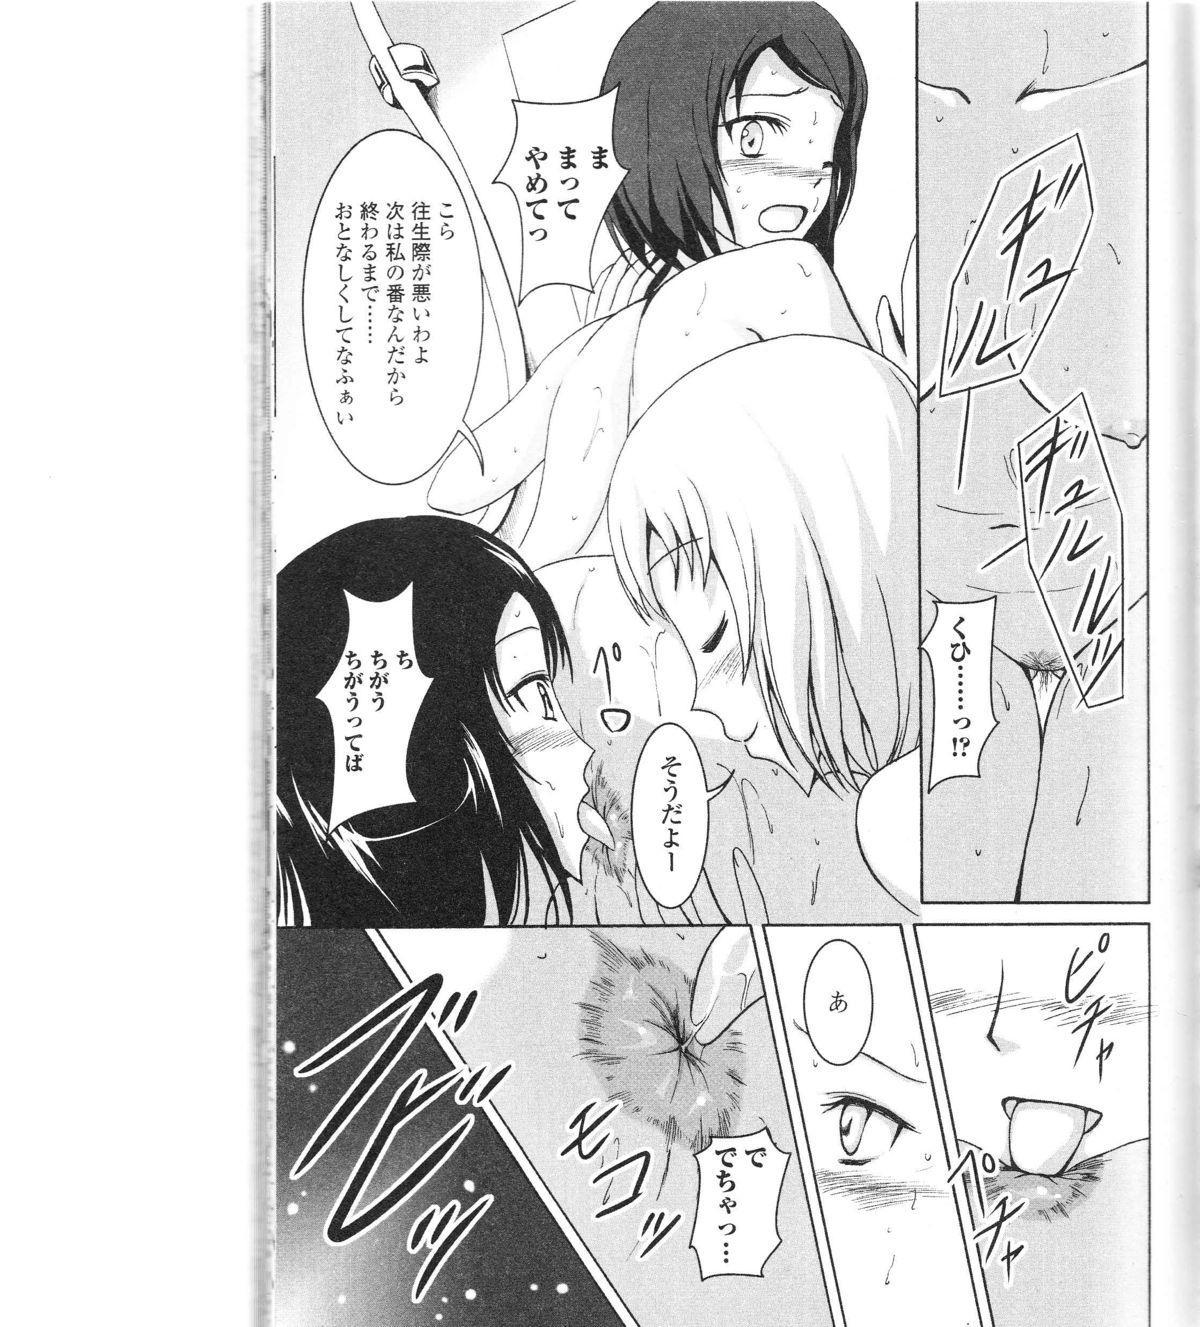 Nozoite wa Ikenai 9 - Do Not Peep! 9 93